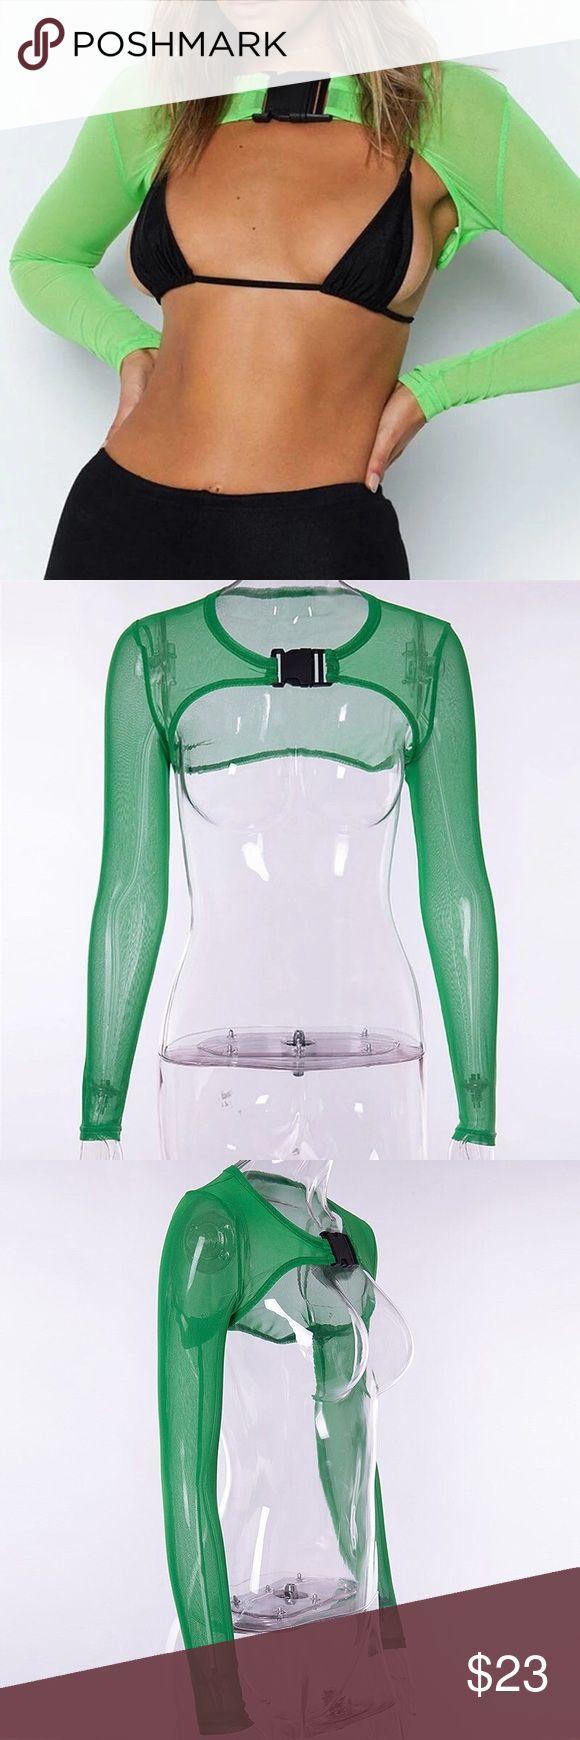 🌟 New 💥 Green Long Sleeve Snap Shirt 🌟 New 💥 Green Long Sleeve Snap …